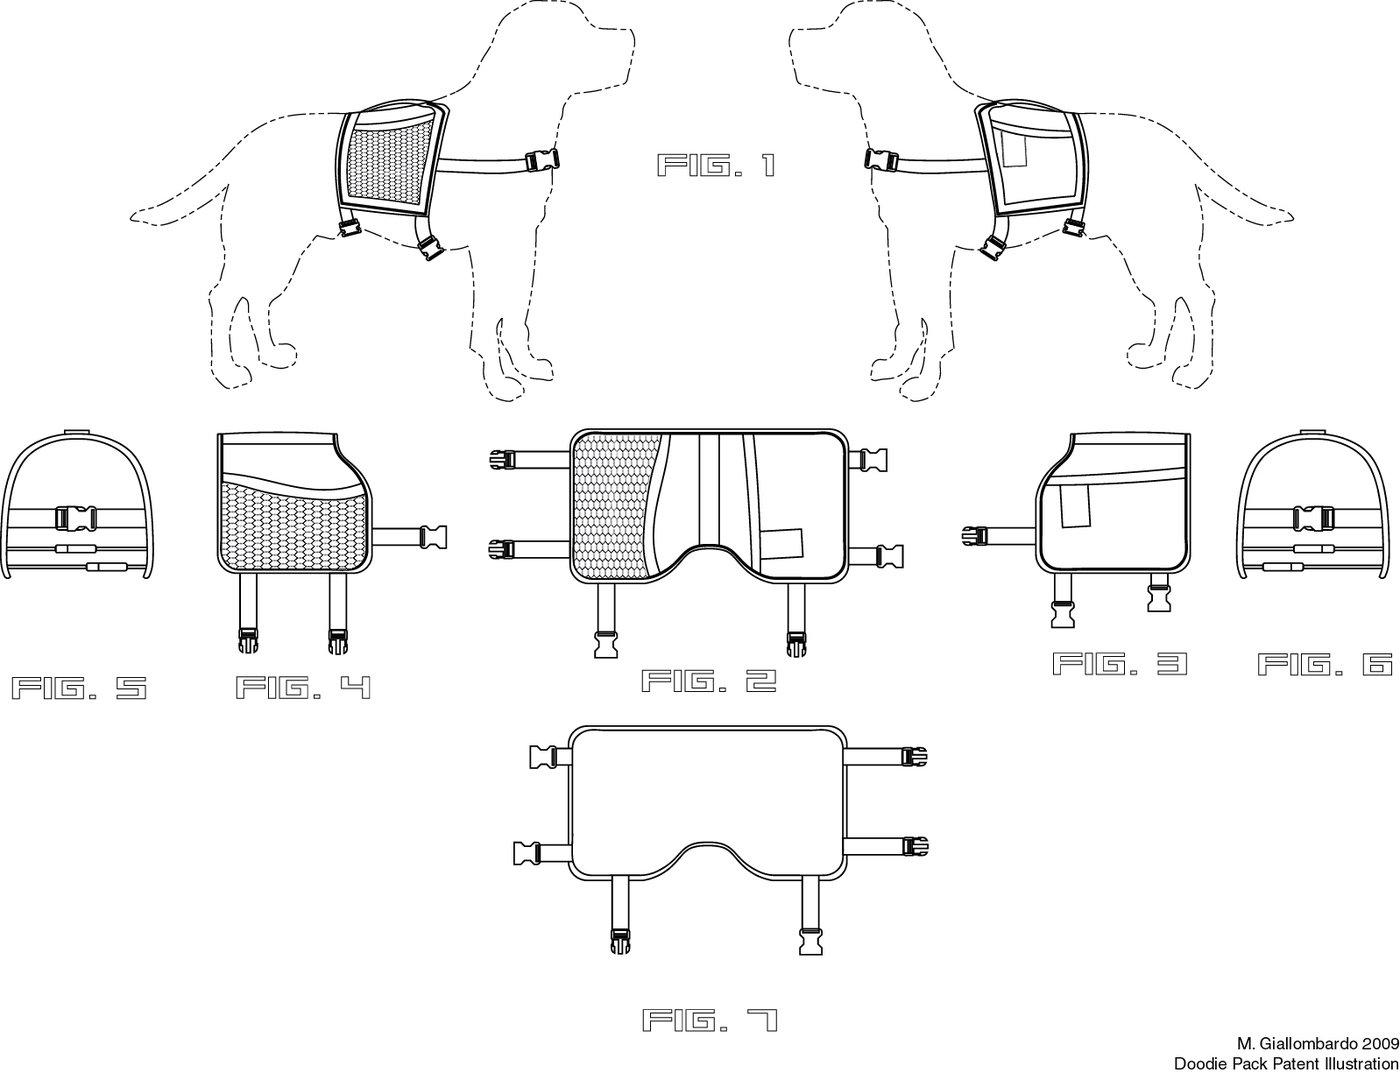 Technical Illustration by Michael Giallombardo at Coroflot.com